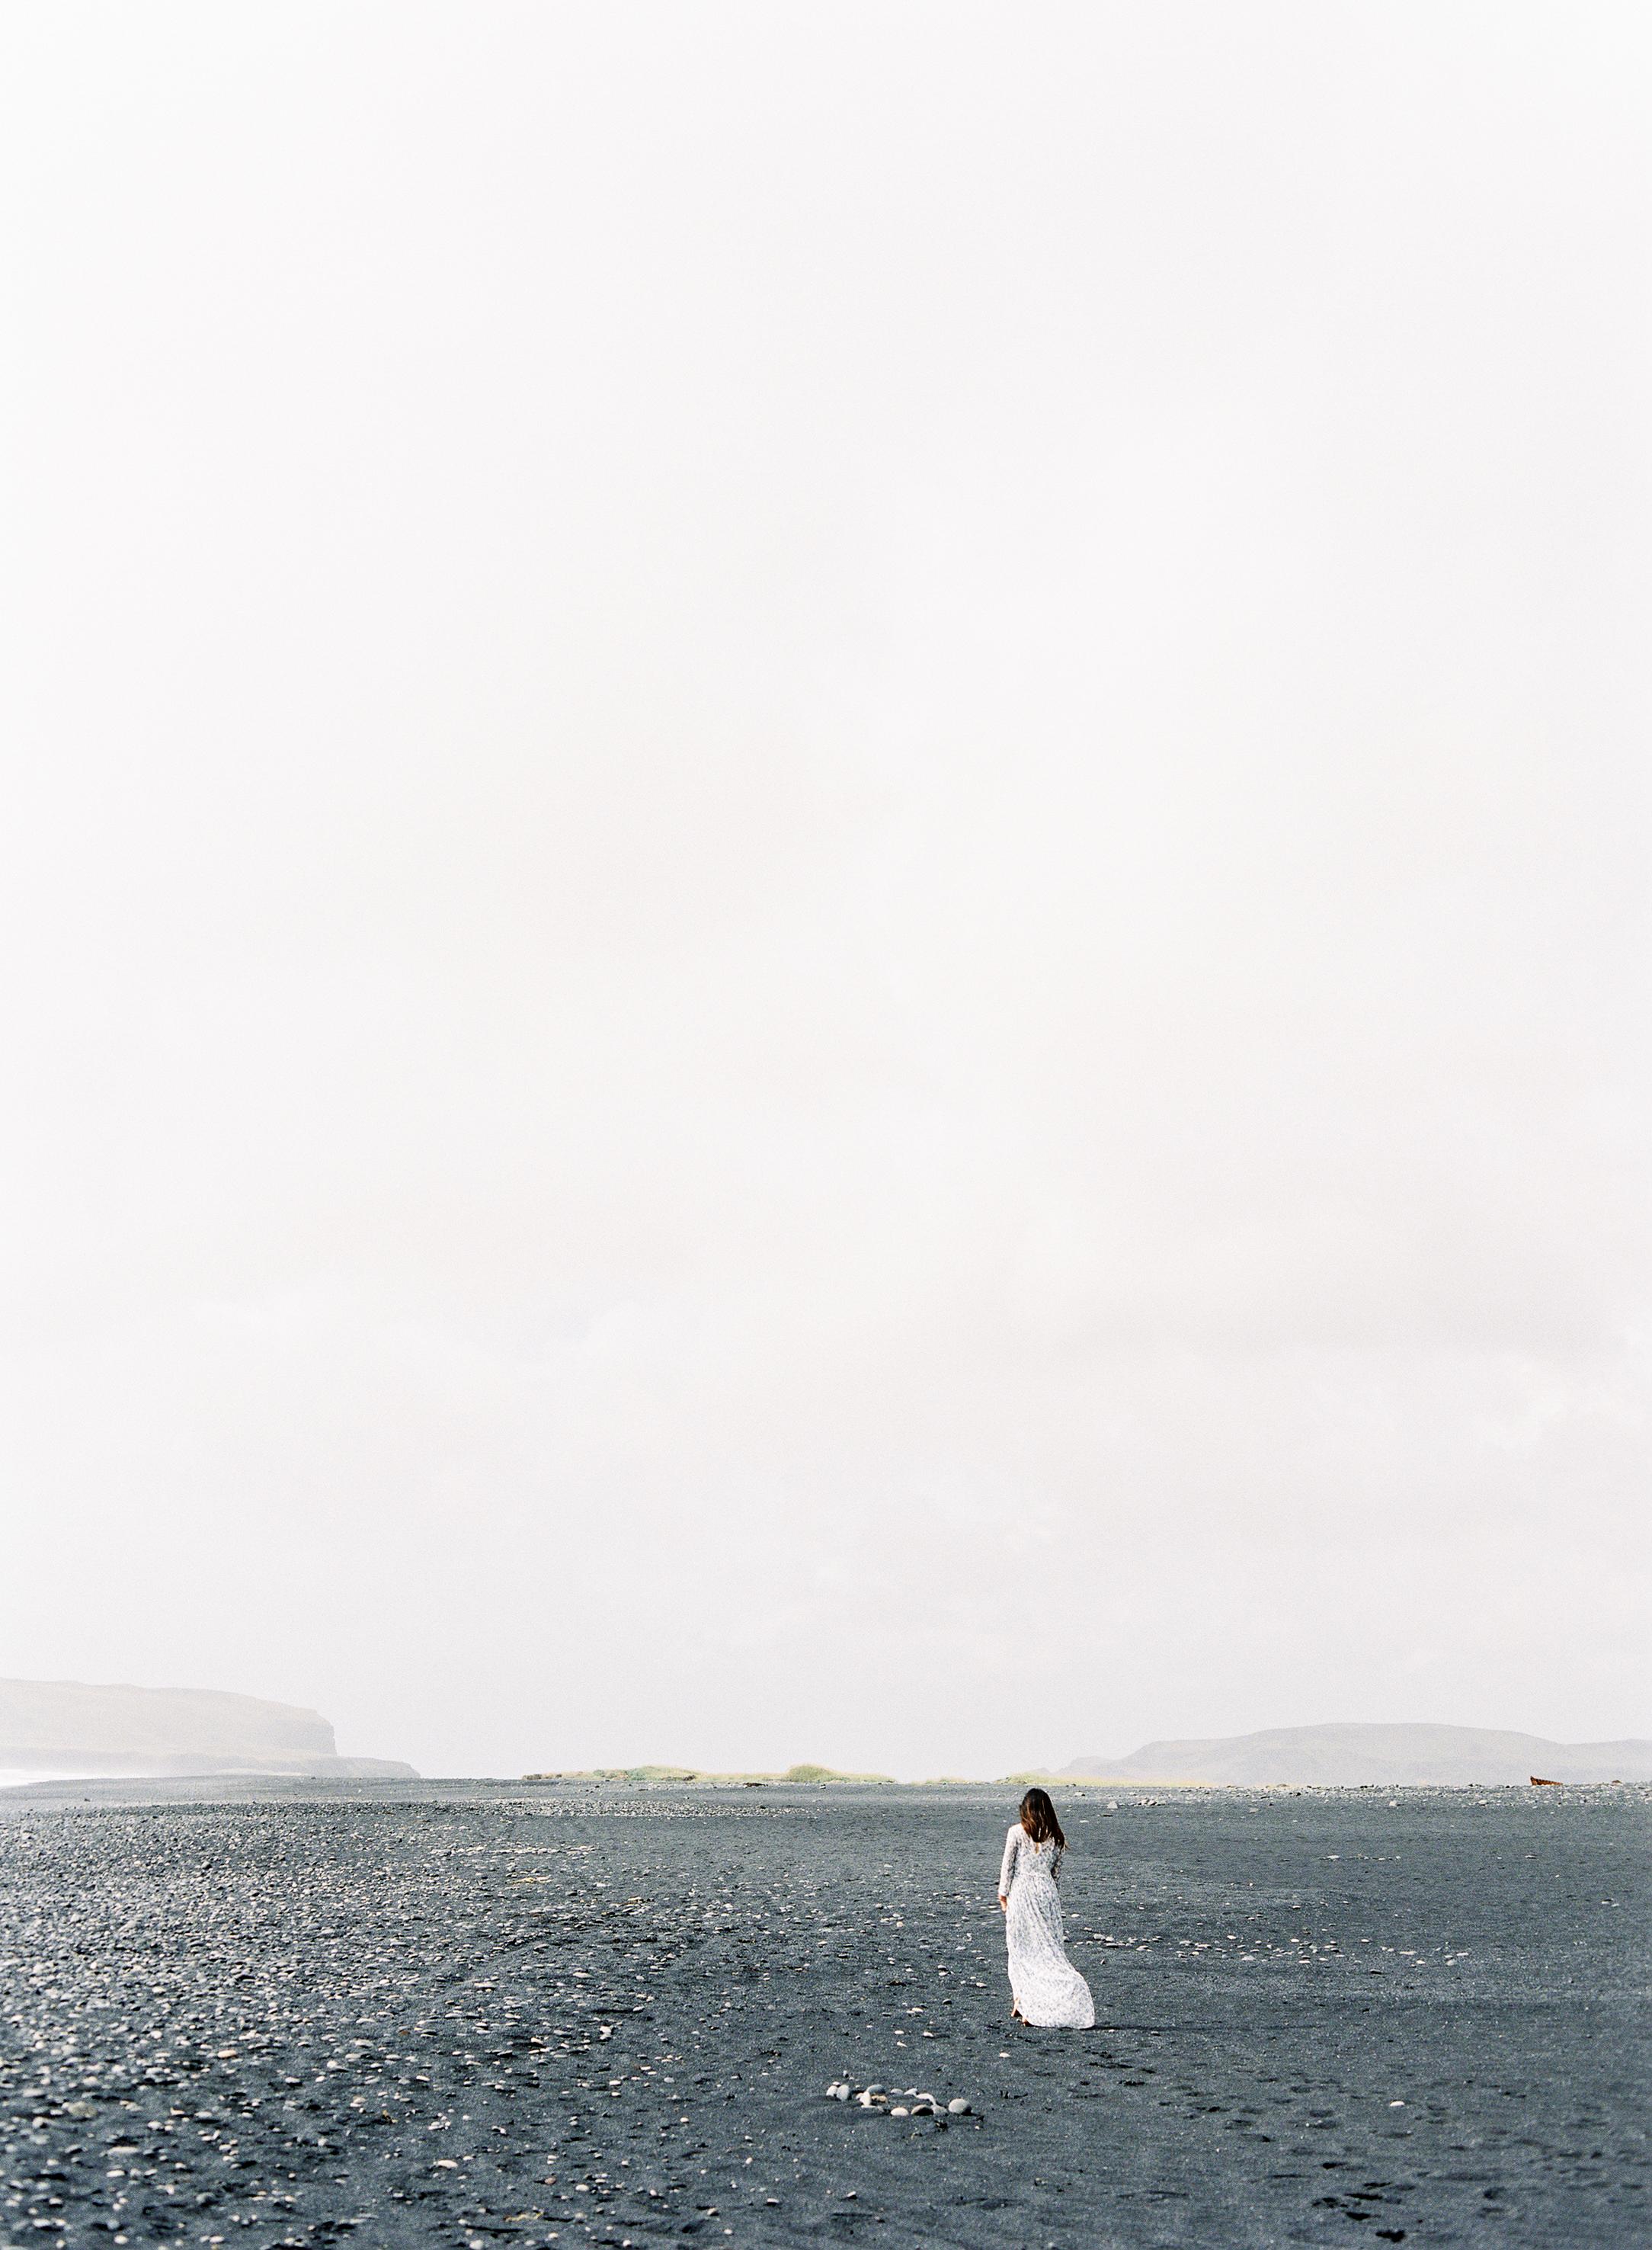 VickiGraftonPhotography-IcelandWeddingEngagementPhotographer-FineArtFilmWeddingPhotographer-216.jpg